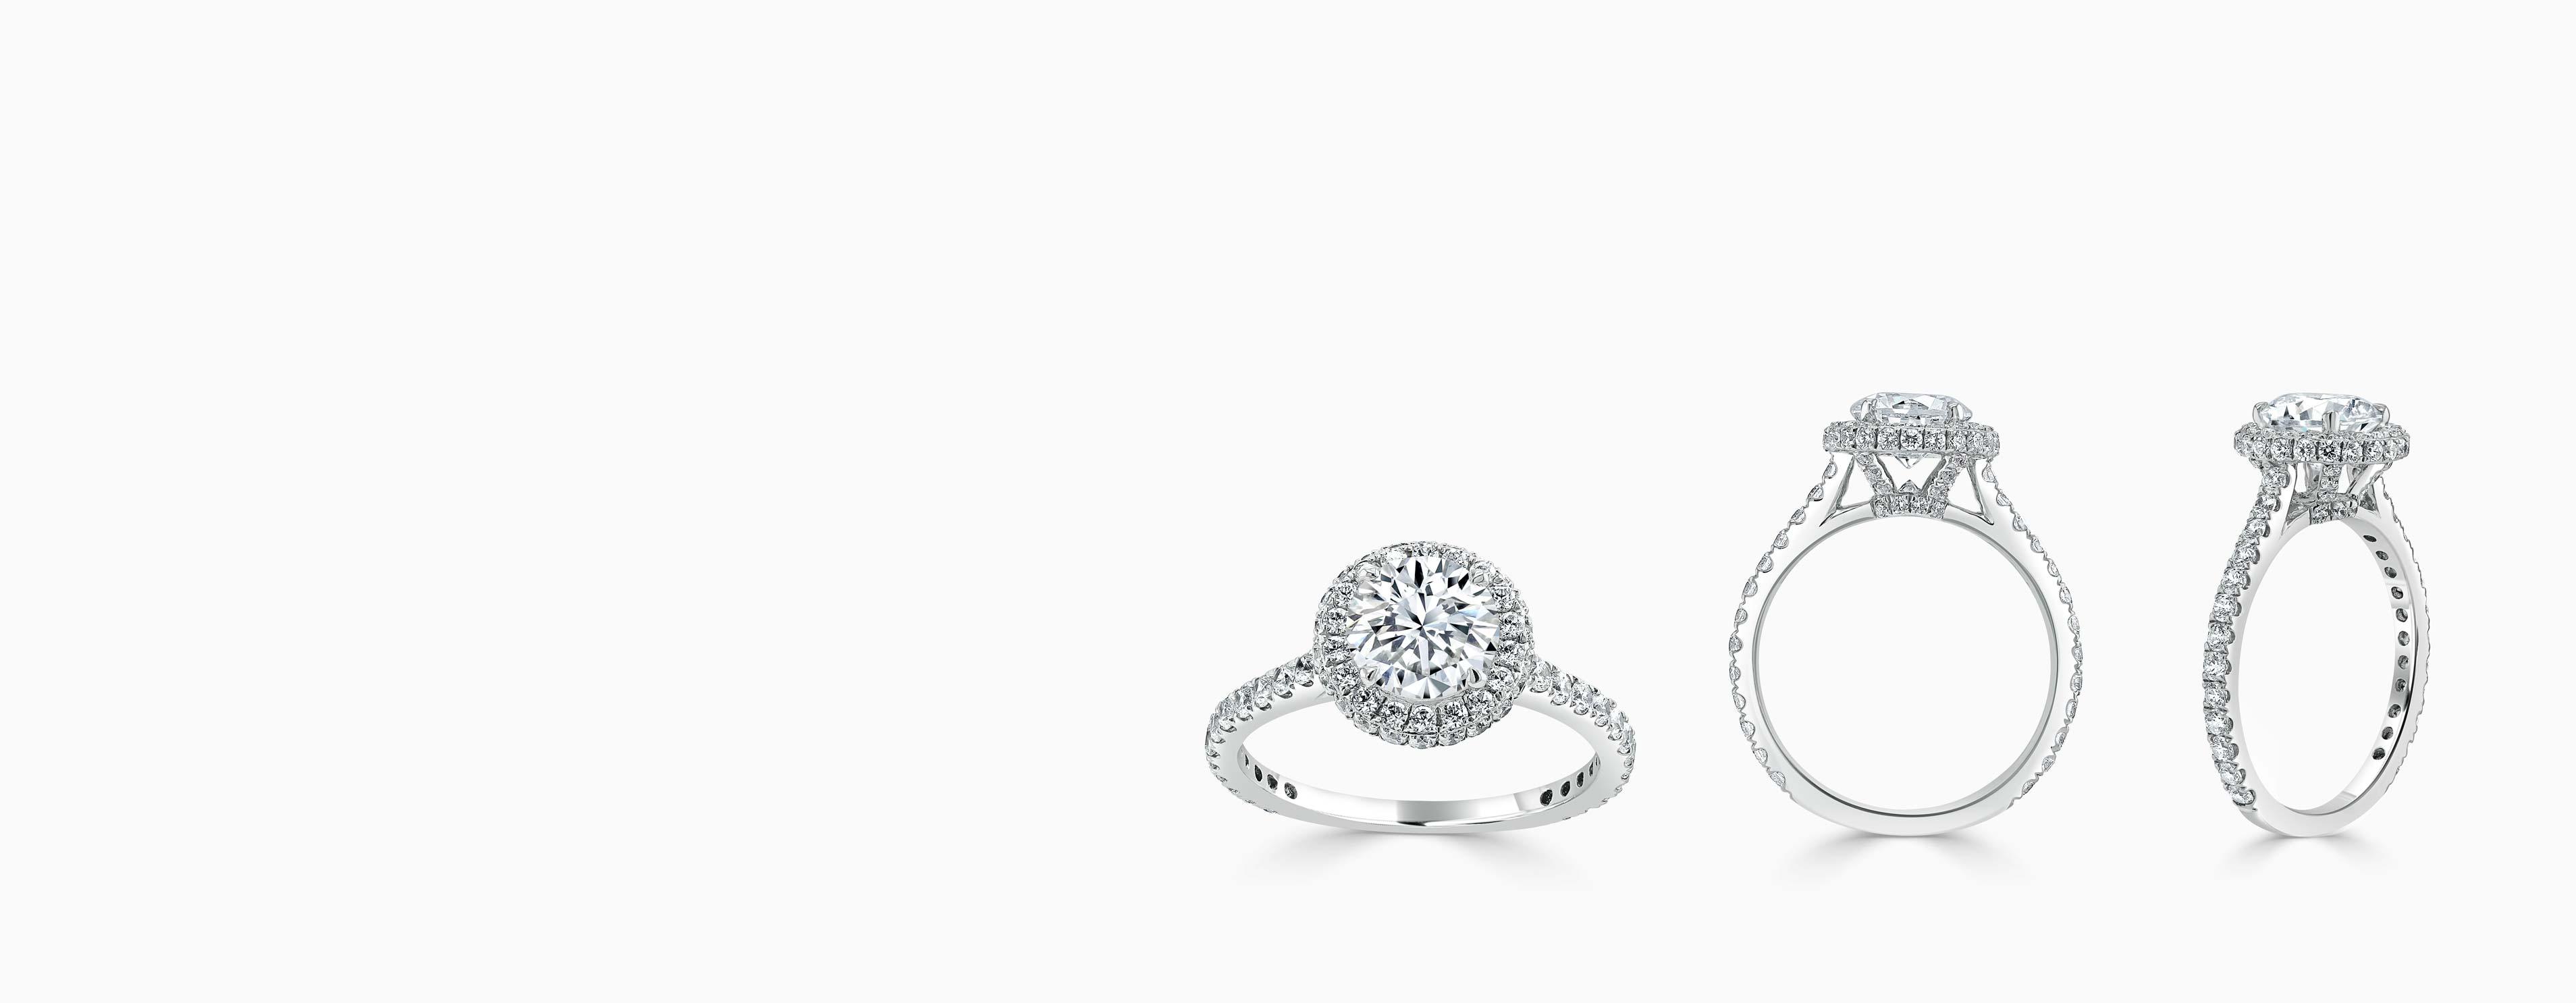 Diamond Halo Engagement Rings - Steven Stone